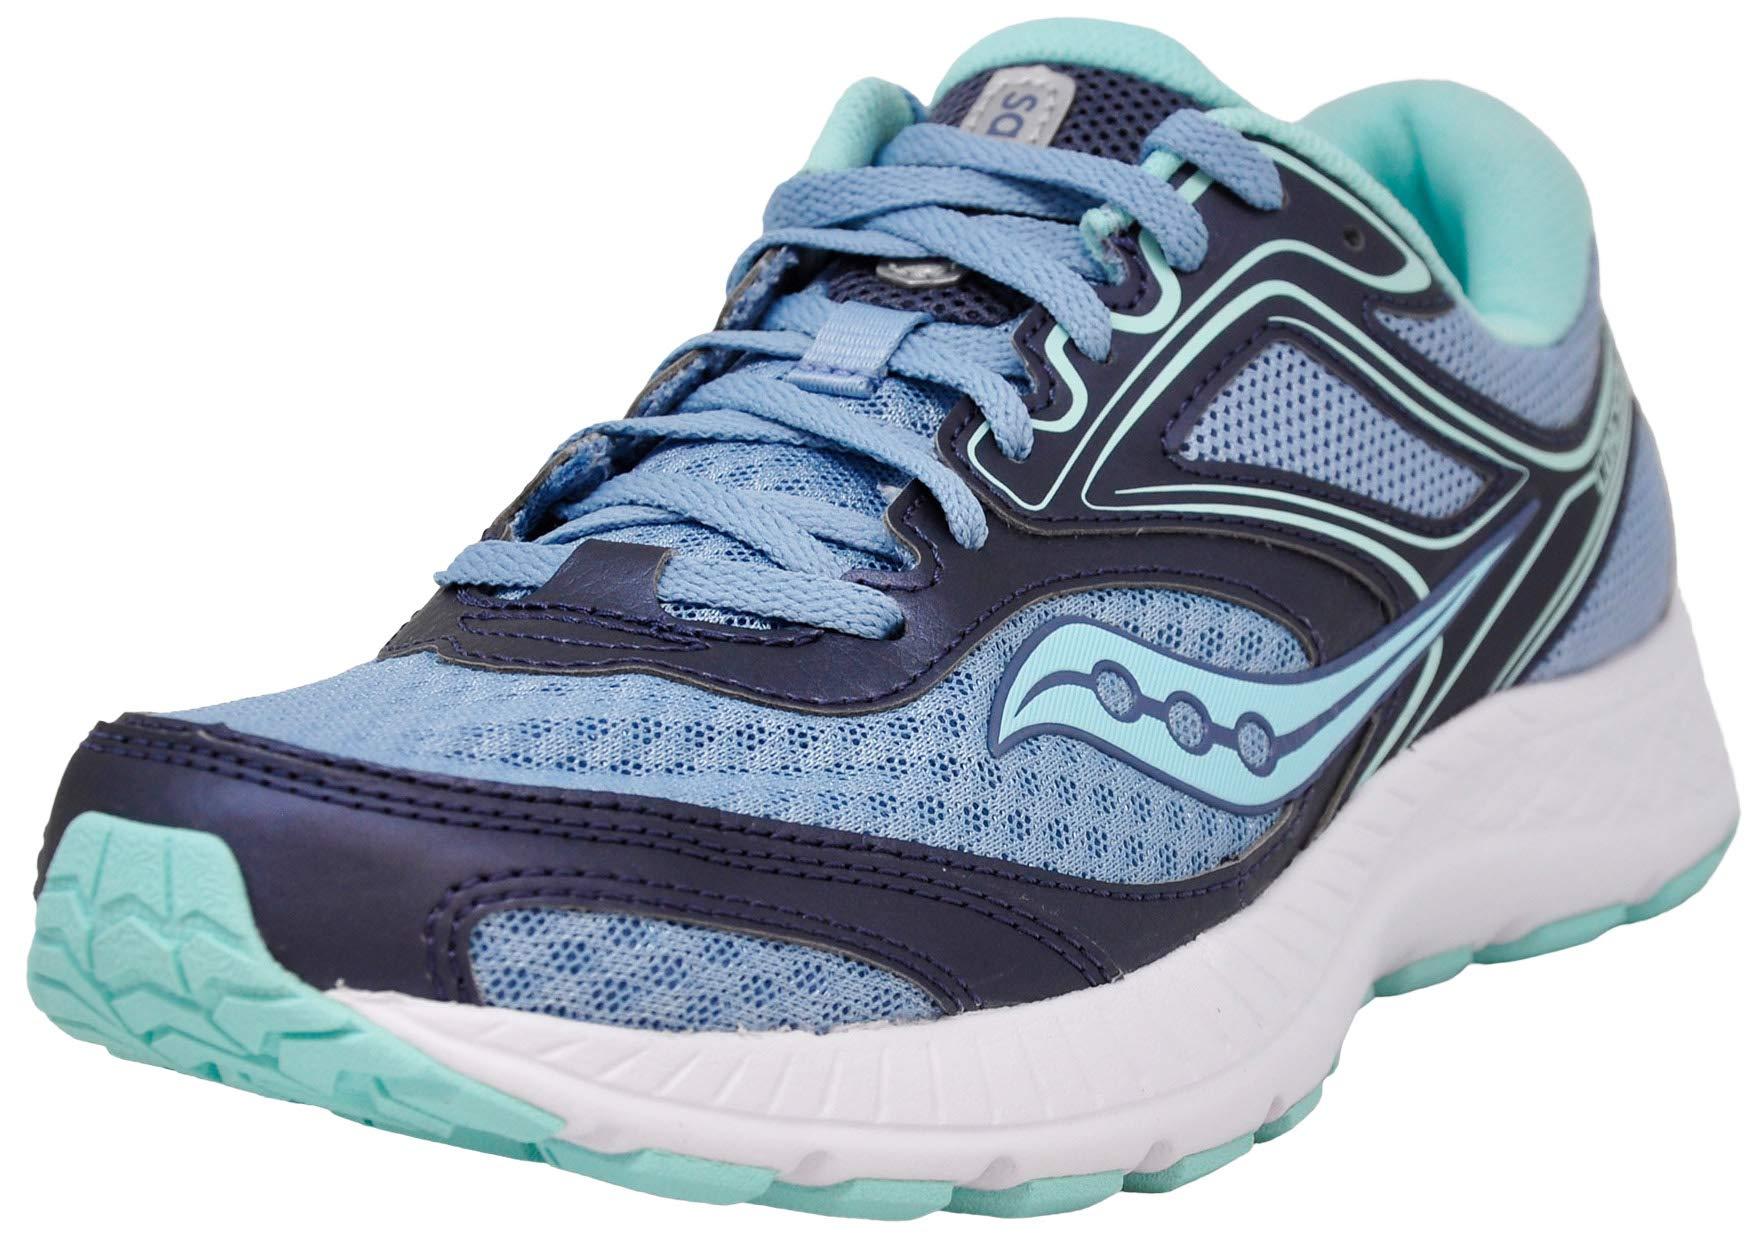 Saucony Women's VERSAFOAM Cohesion 12 Road Running Shoe, Blue/Mint 11 M US by Saucony